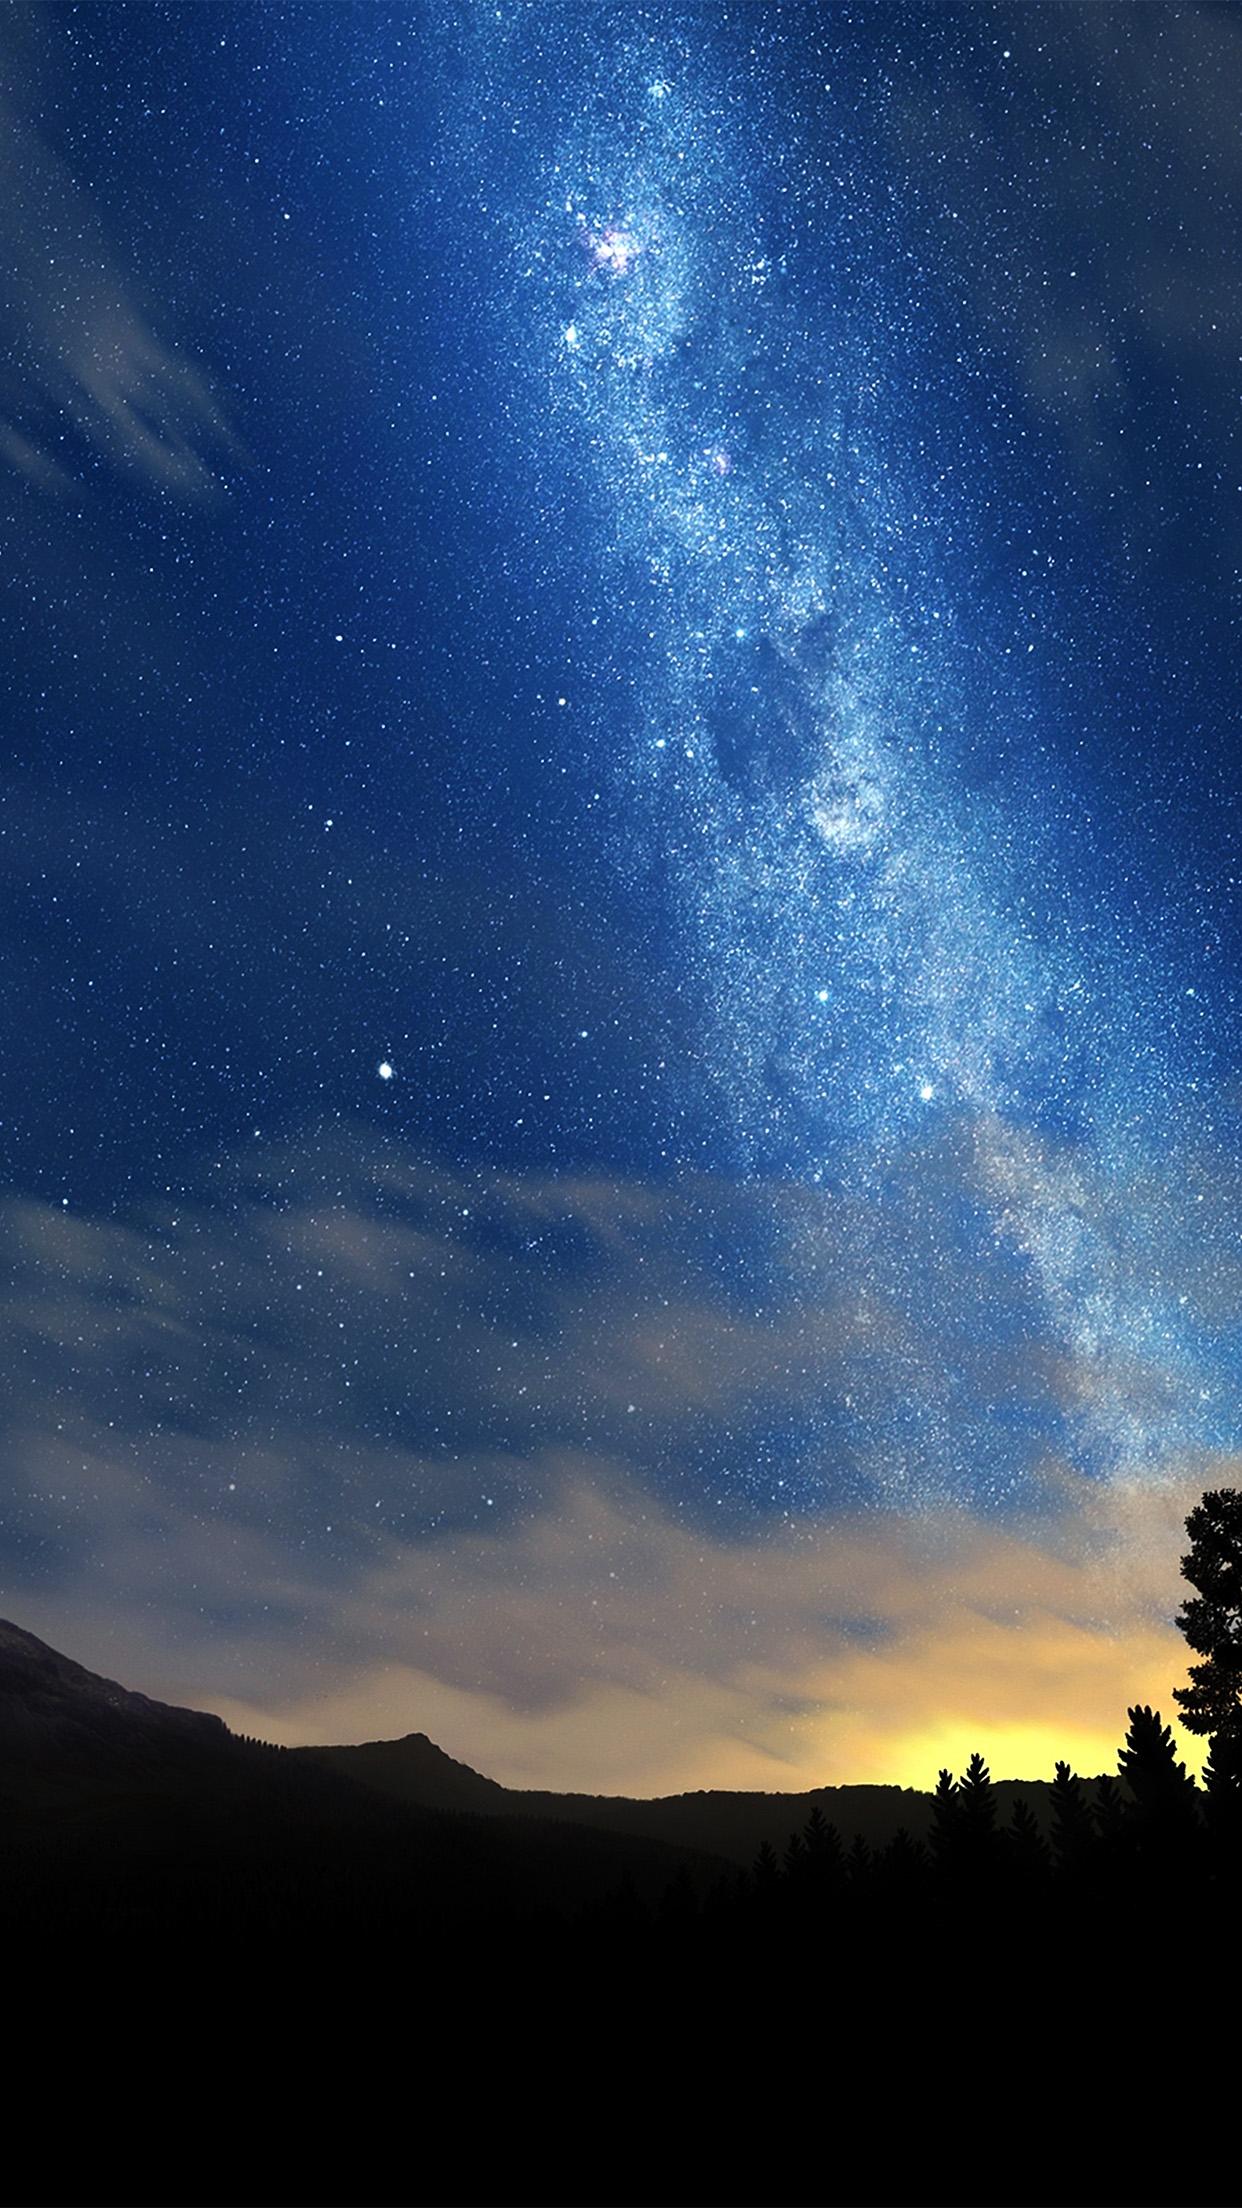 nd07-wonderful-tonight-space-star-sunset-mountain-wallpaper